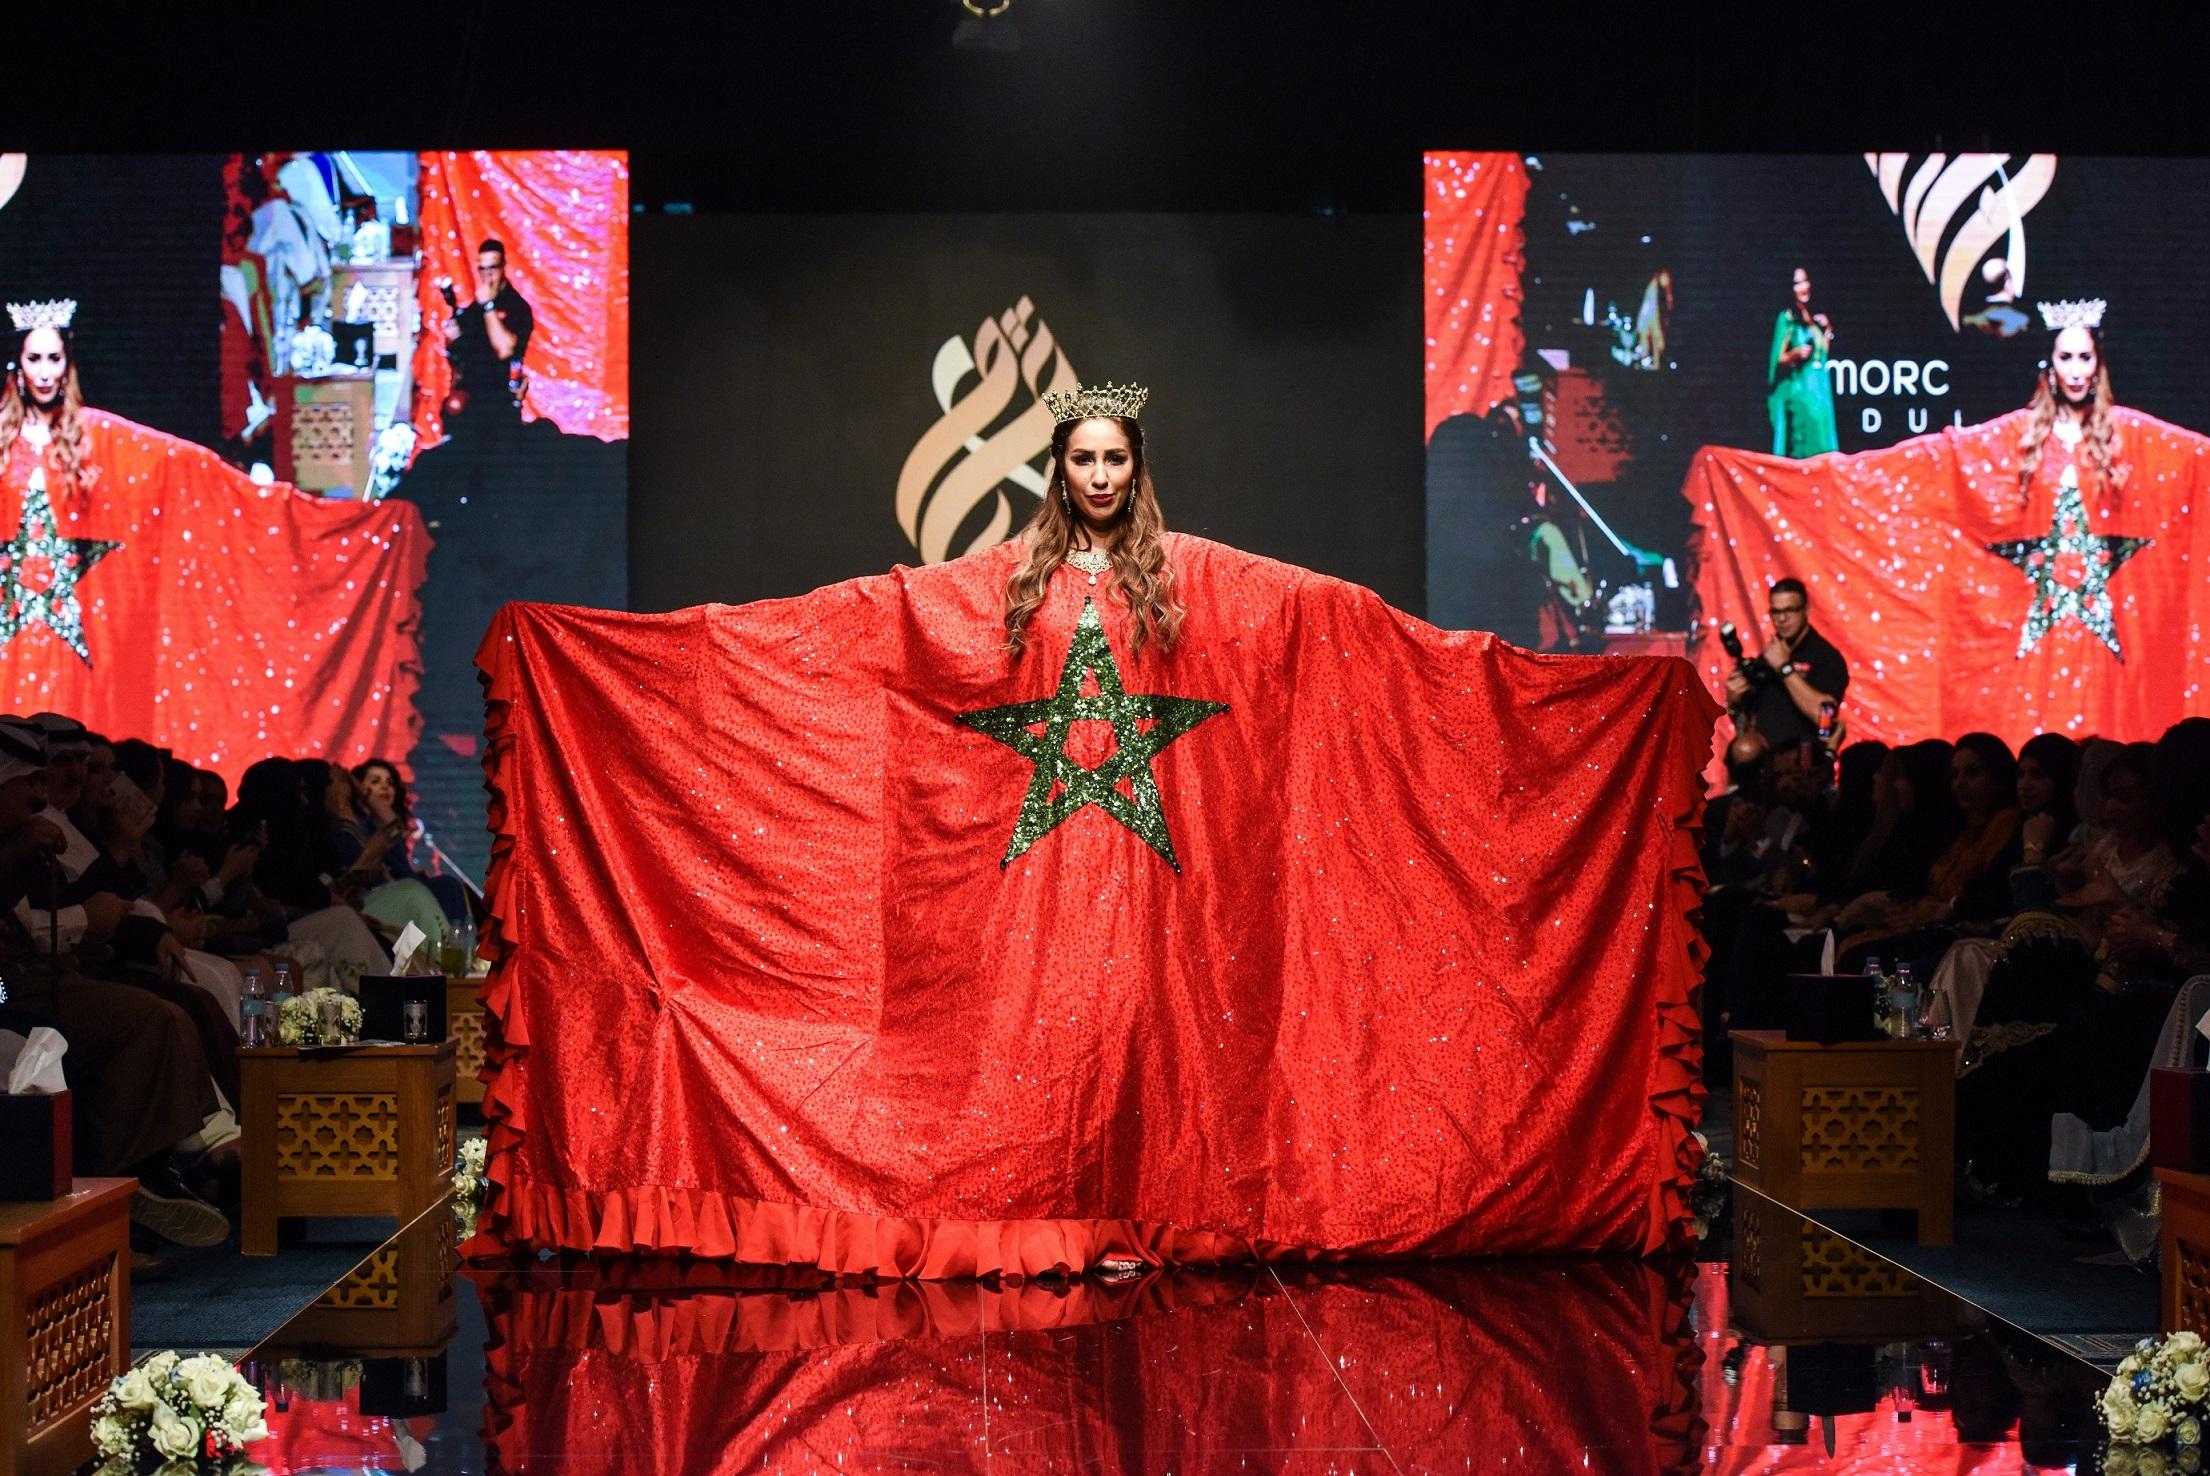 "Résultat de recherche d'images pour ""بحضور نجوم الفن والاعلام المغربي القفطان المغربي يتألق في دبي بليلة أسطورية"""